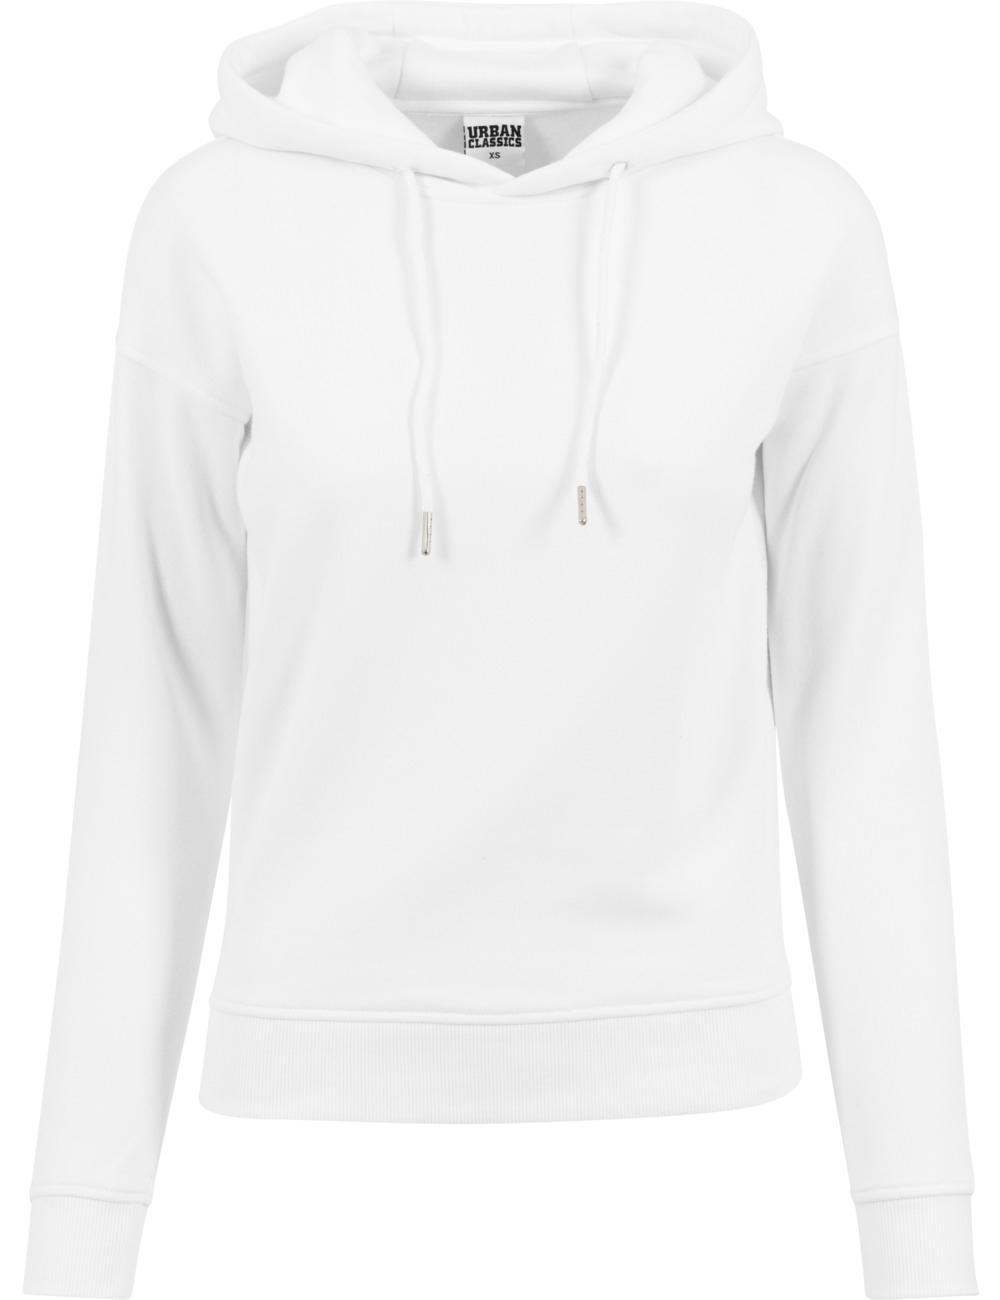 Urban Classics Damen Sweater Hoody L, White (20220)